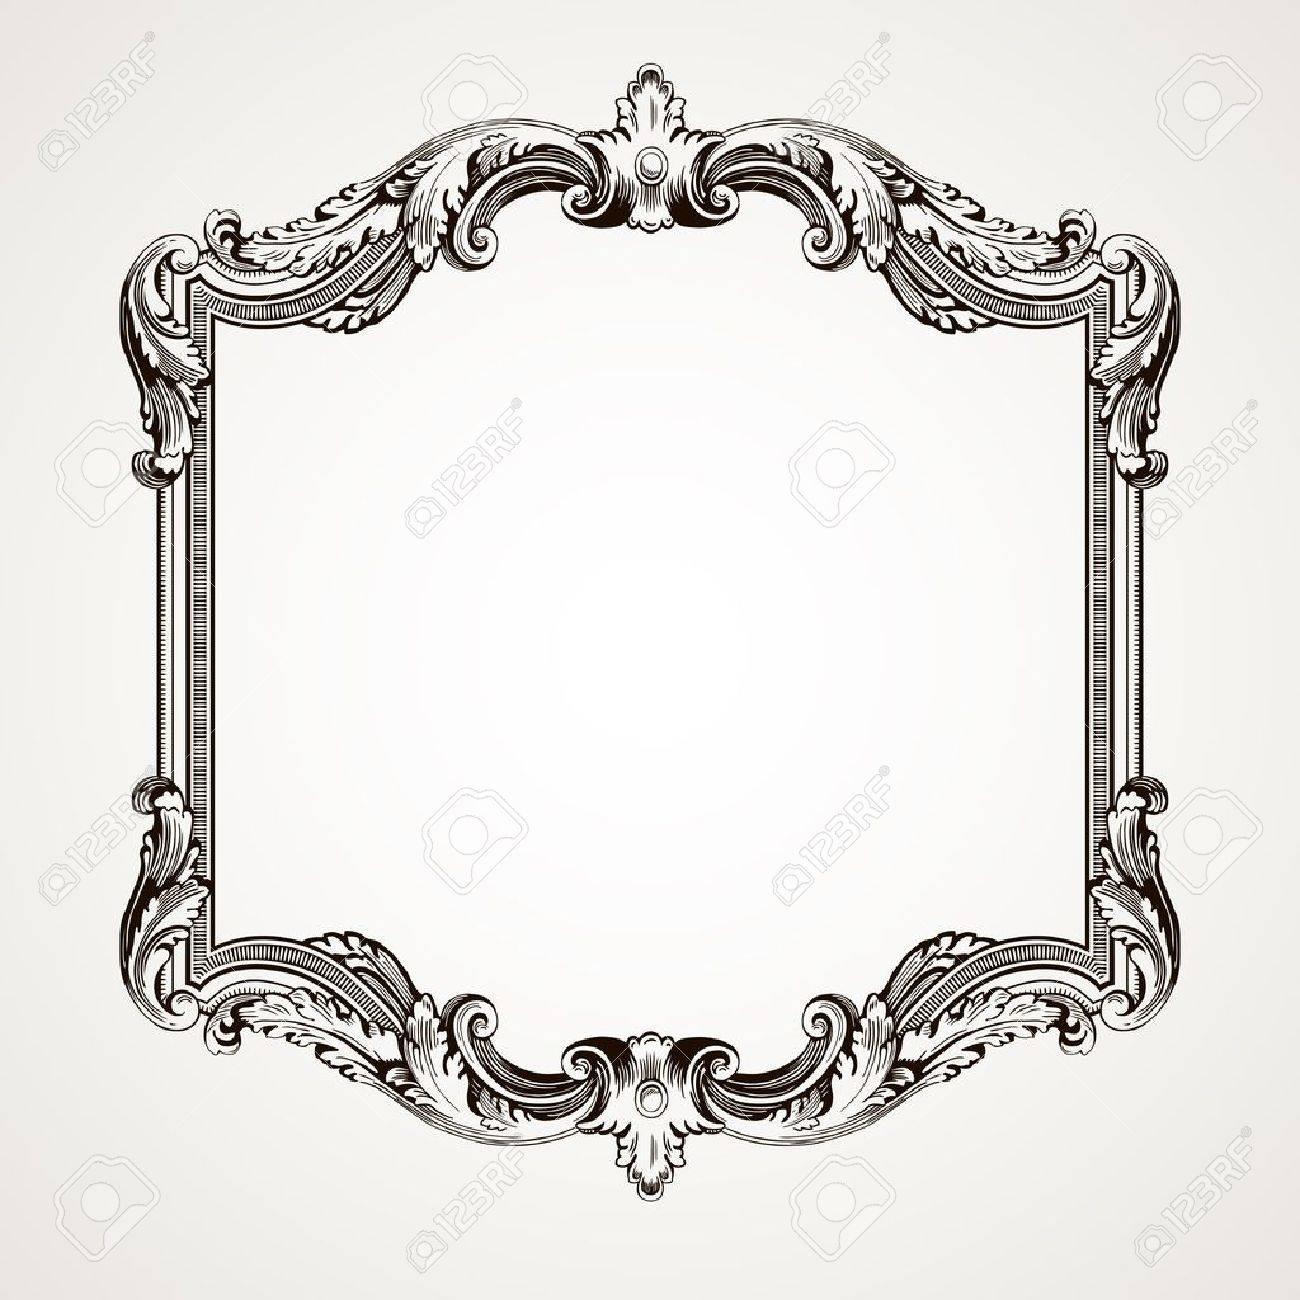 vector vector vintage border frame engraving with retro ornament pattern in antique rococo style decorative design